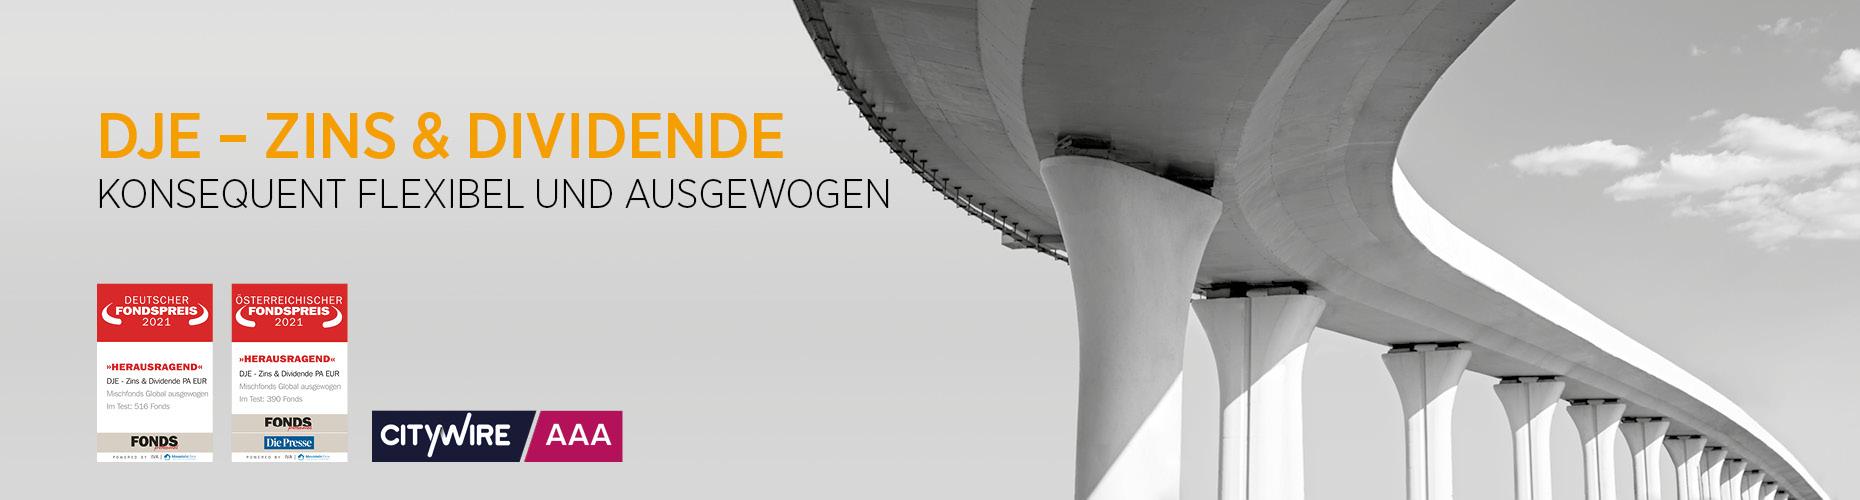 DJE_Zins_Dividende_Bruecke_WEB_1860 x 500 Pixel